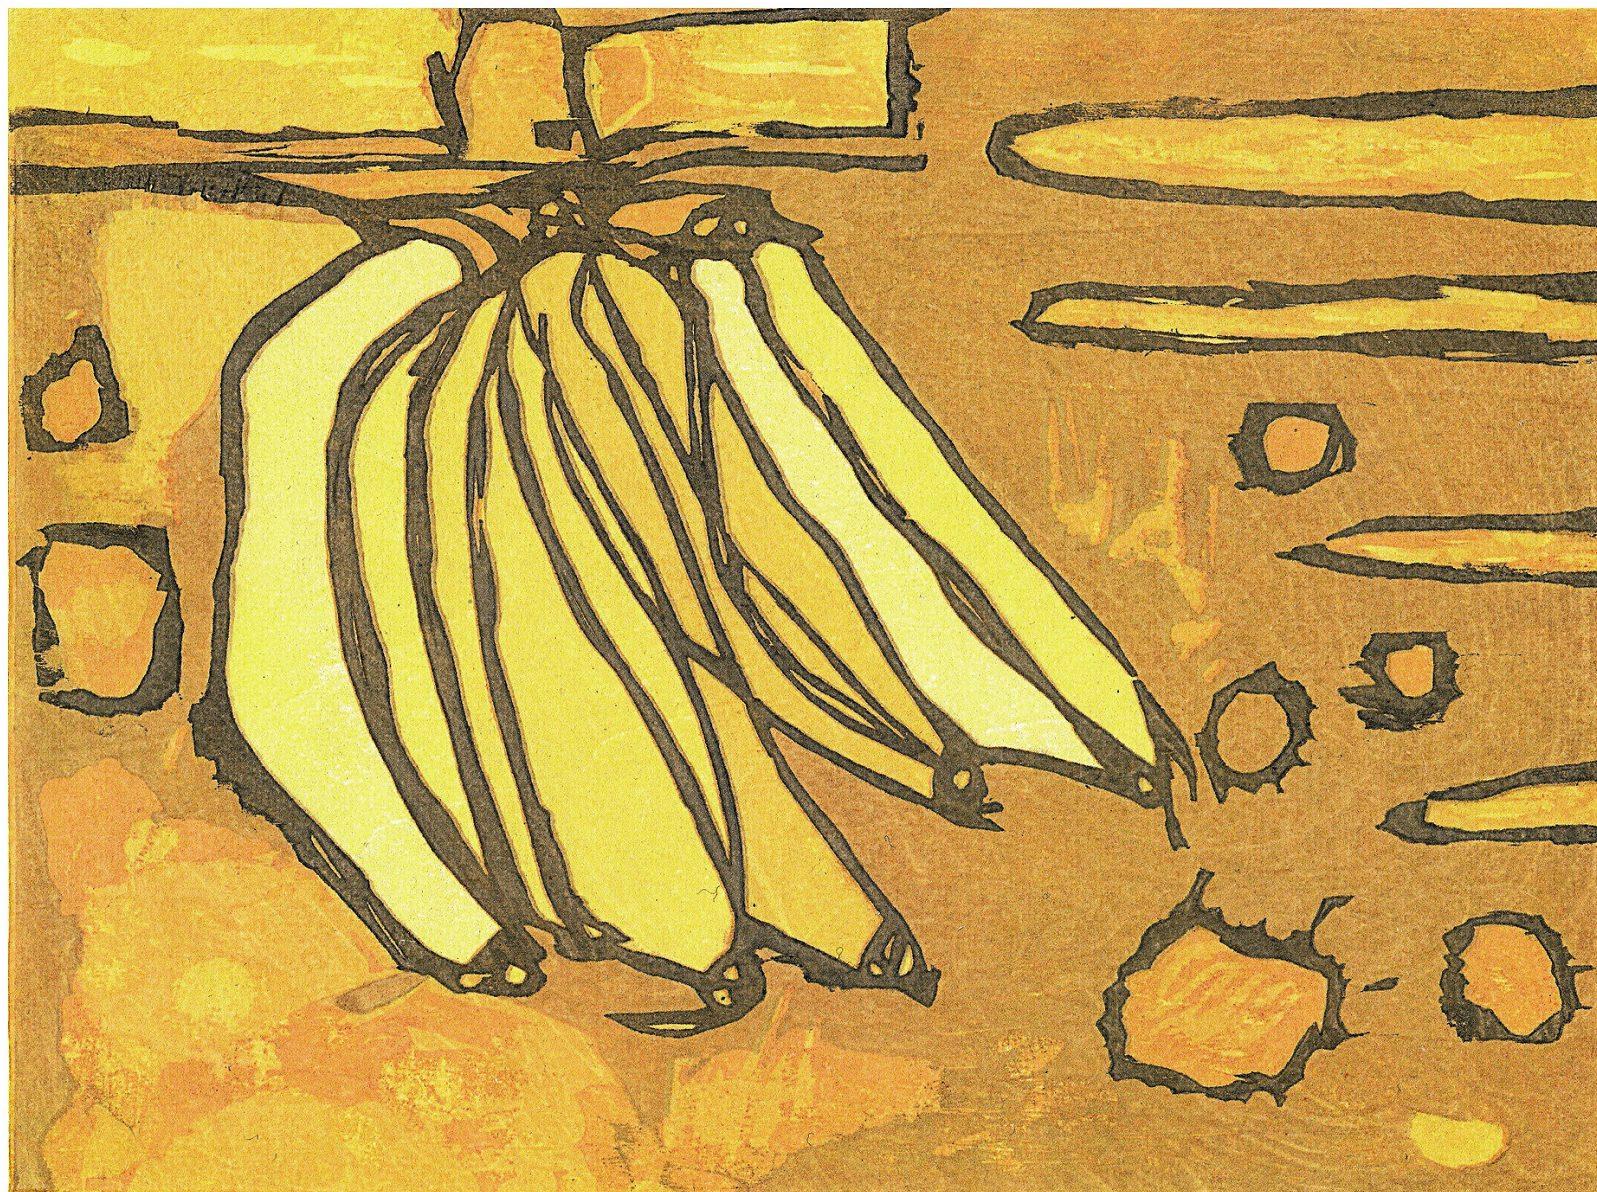 Flotteur de banane Adrian Holmes Gravure sur bois sur Awagami Okawara Select 51gsm, Edition 15